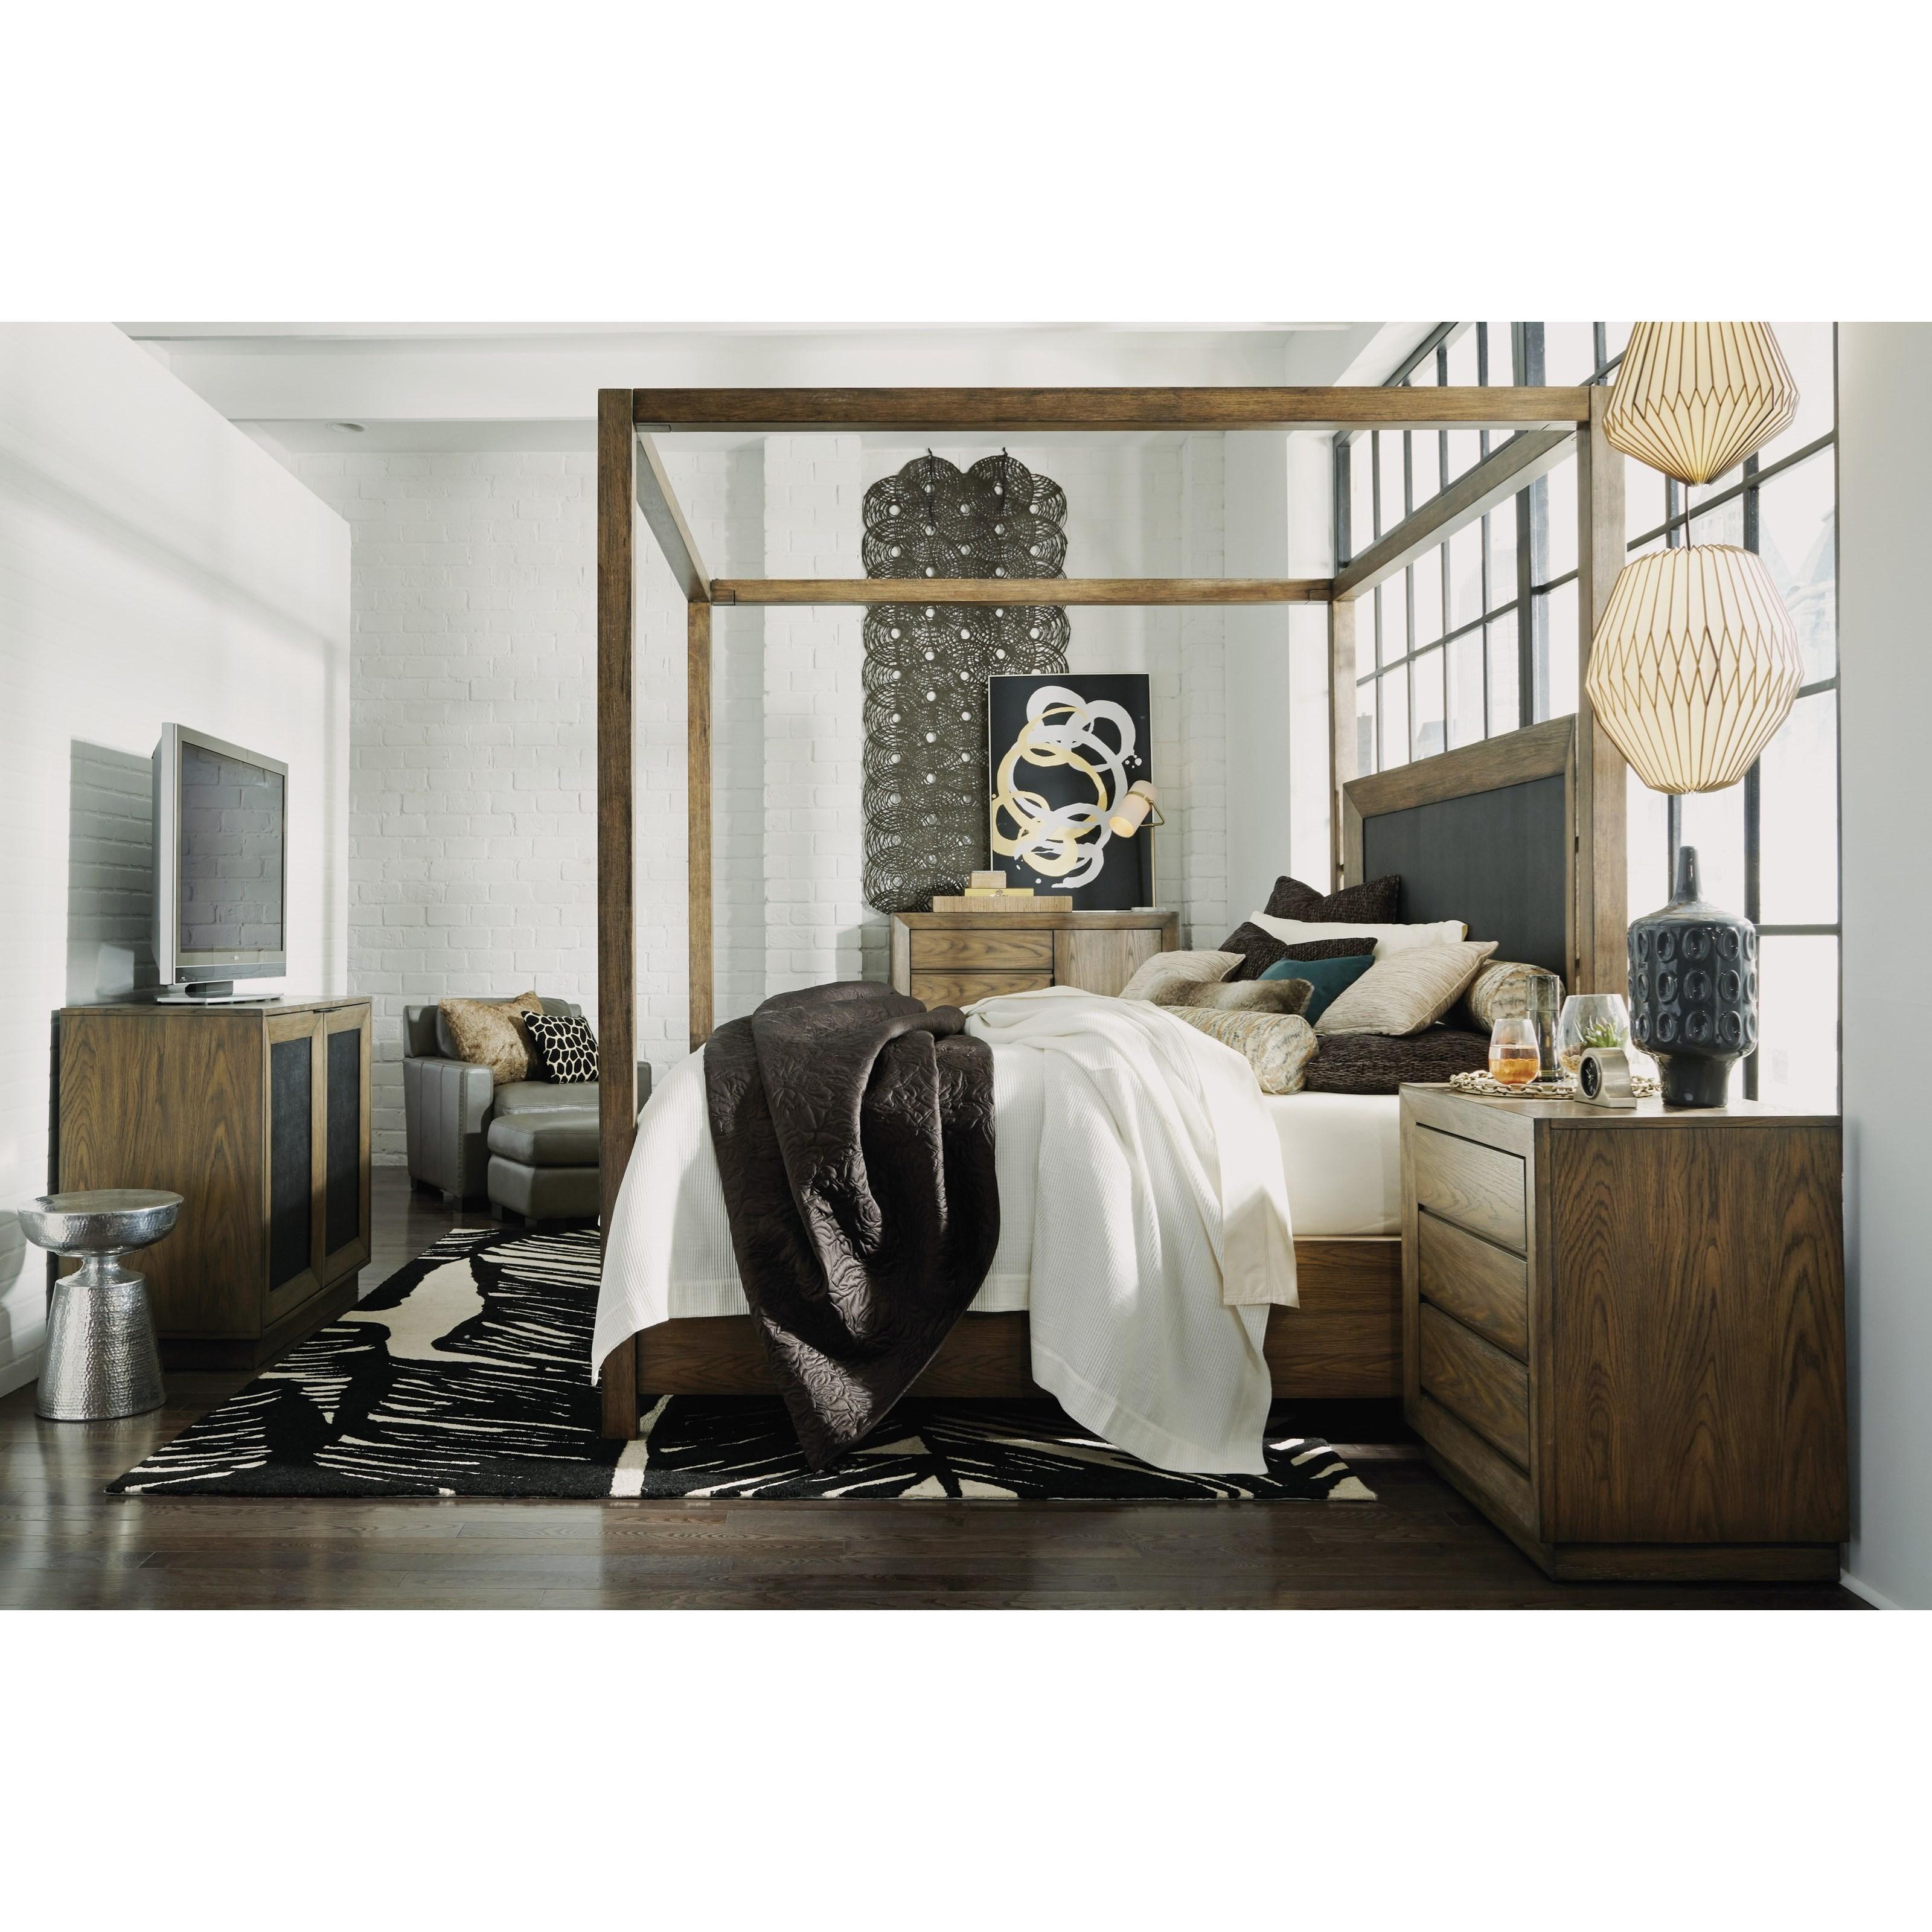 Flexsteel Wynwood Collection Maximus Casual California King Bedroom